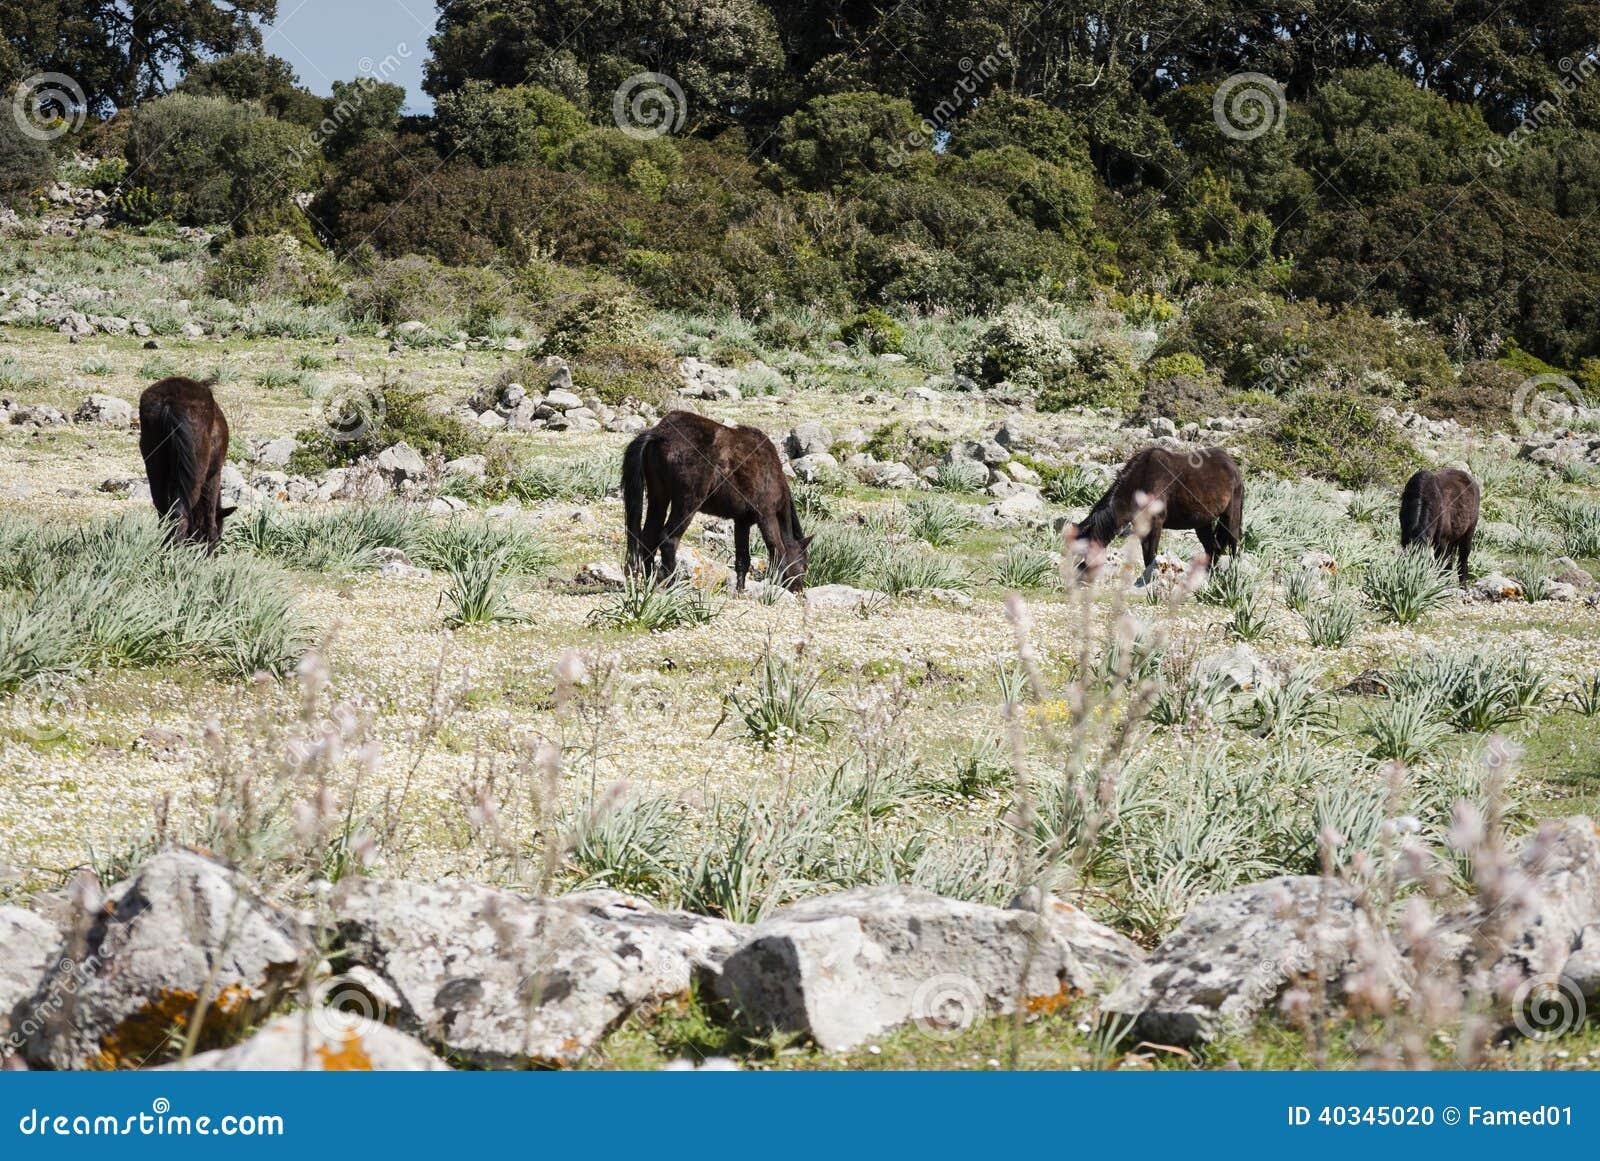 Sardinige. De Giara-paarden